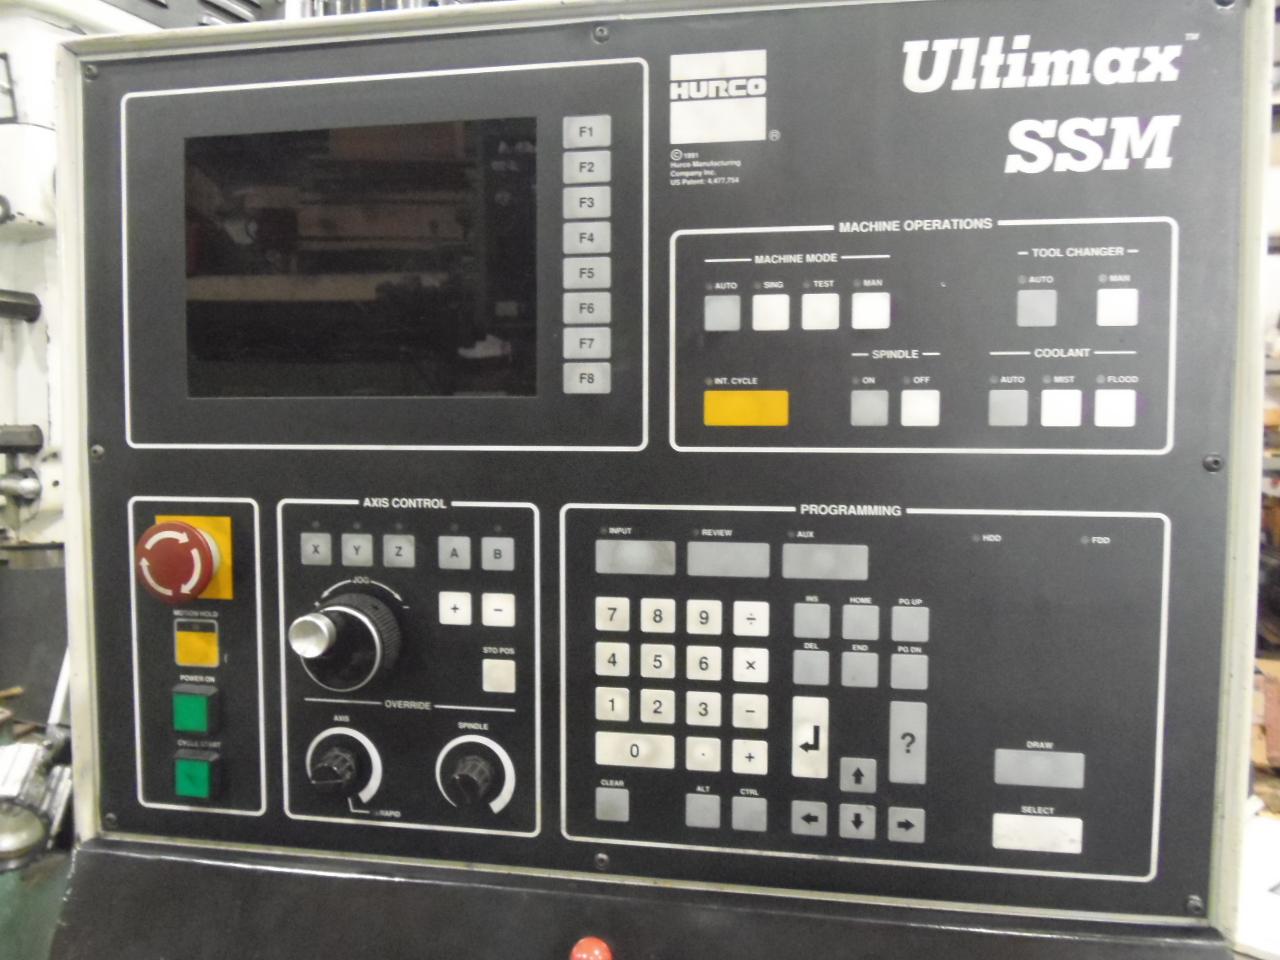 HURCO 30 SSM, CONVERSATIONAL CONTROL, 35 X 18 X 20 TRAVELS, 1999, BED TYPE,